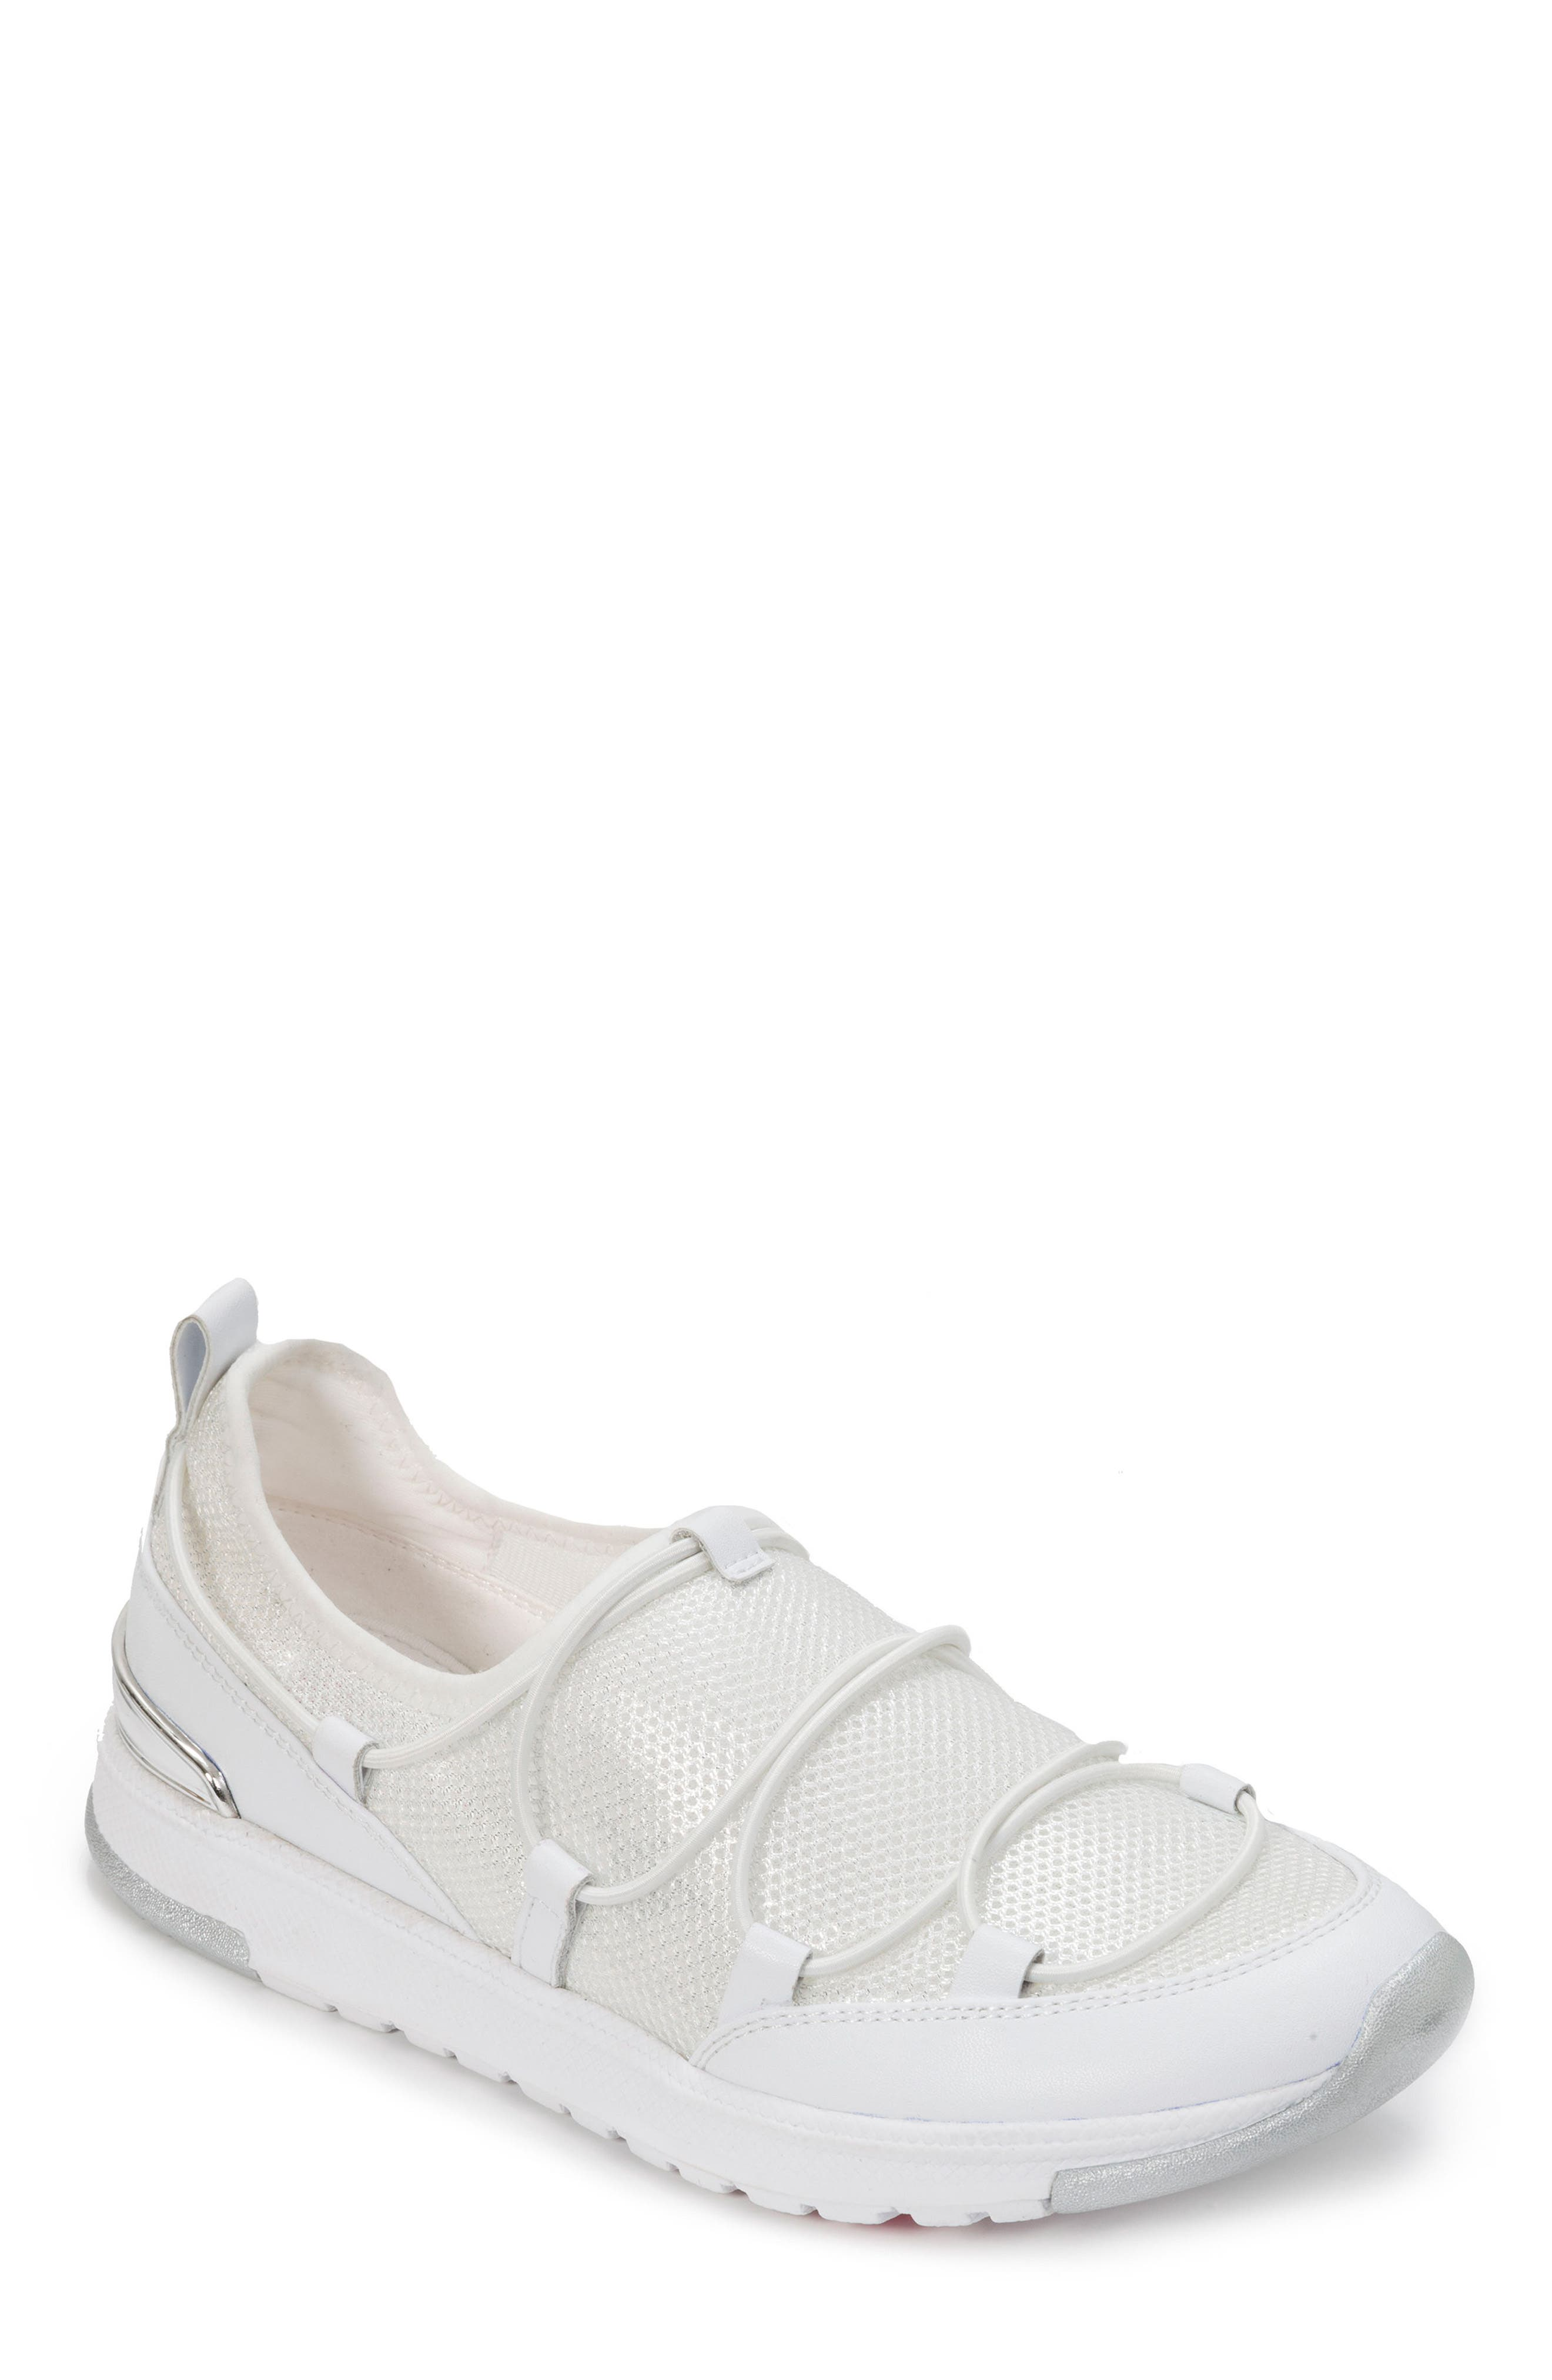 Foot Petals Bree Sneaker (Women)